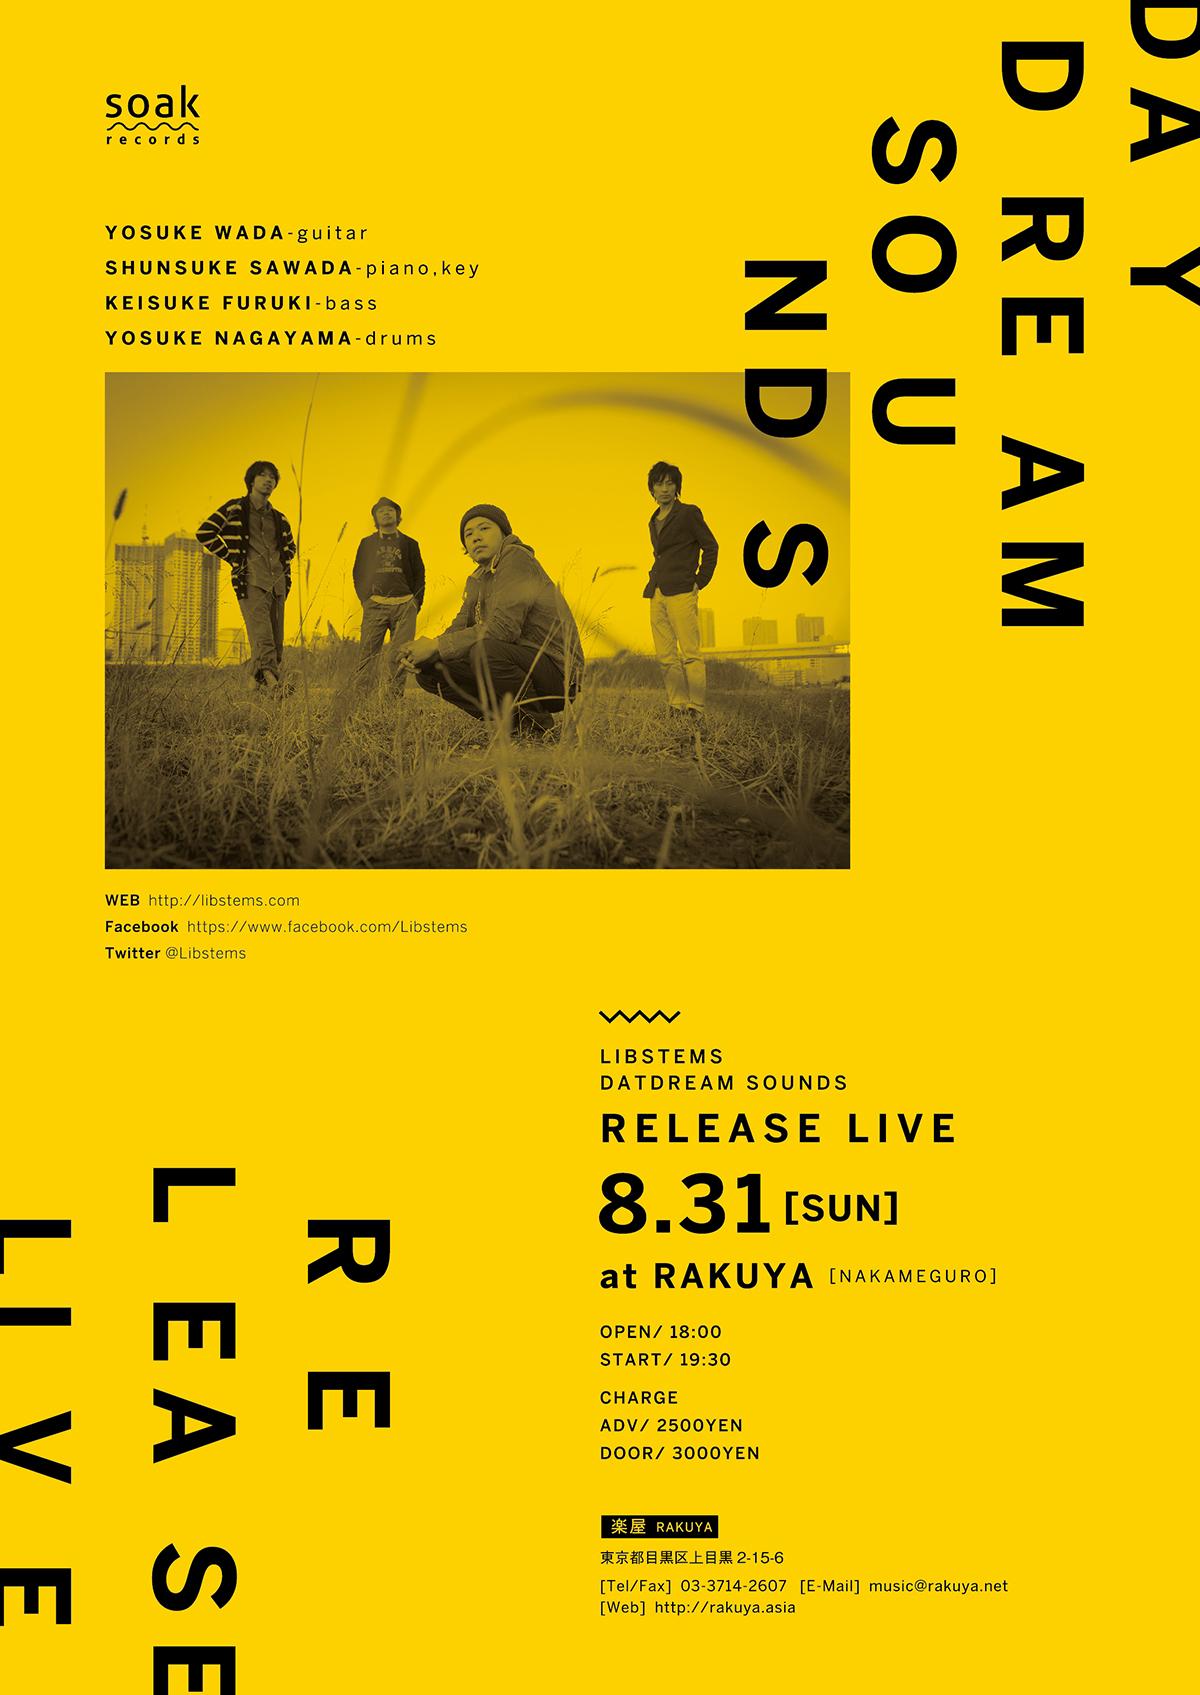 Libstems / Daydream Sounds Flyer